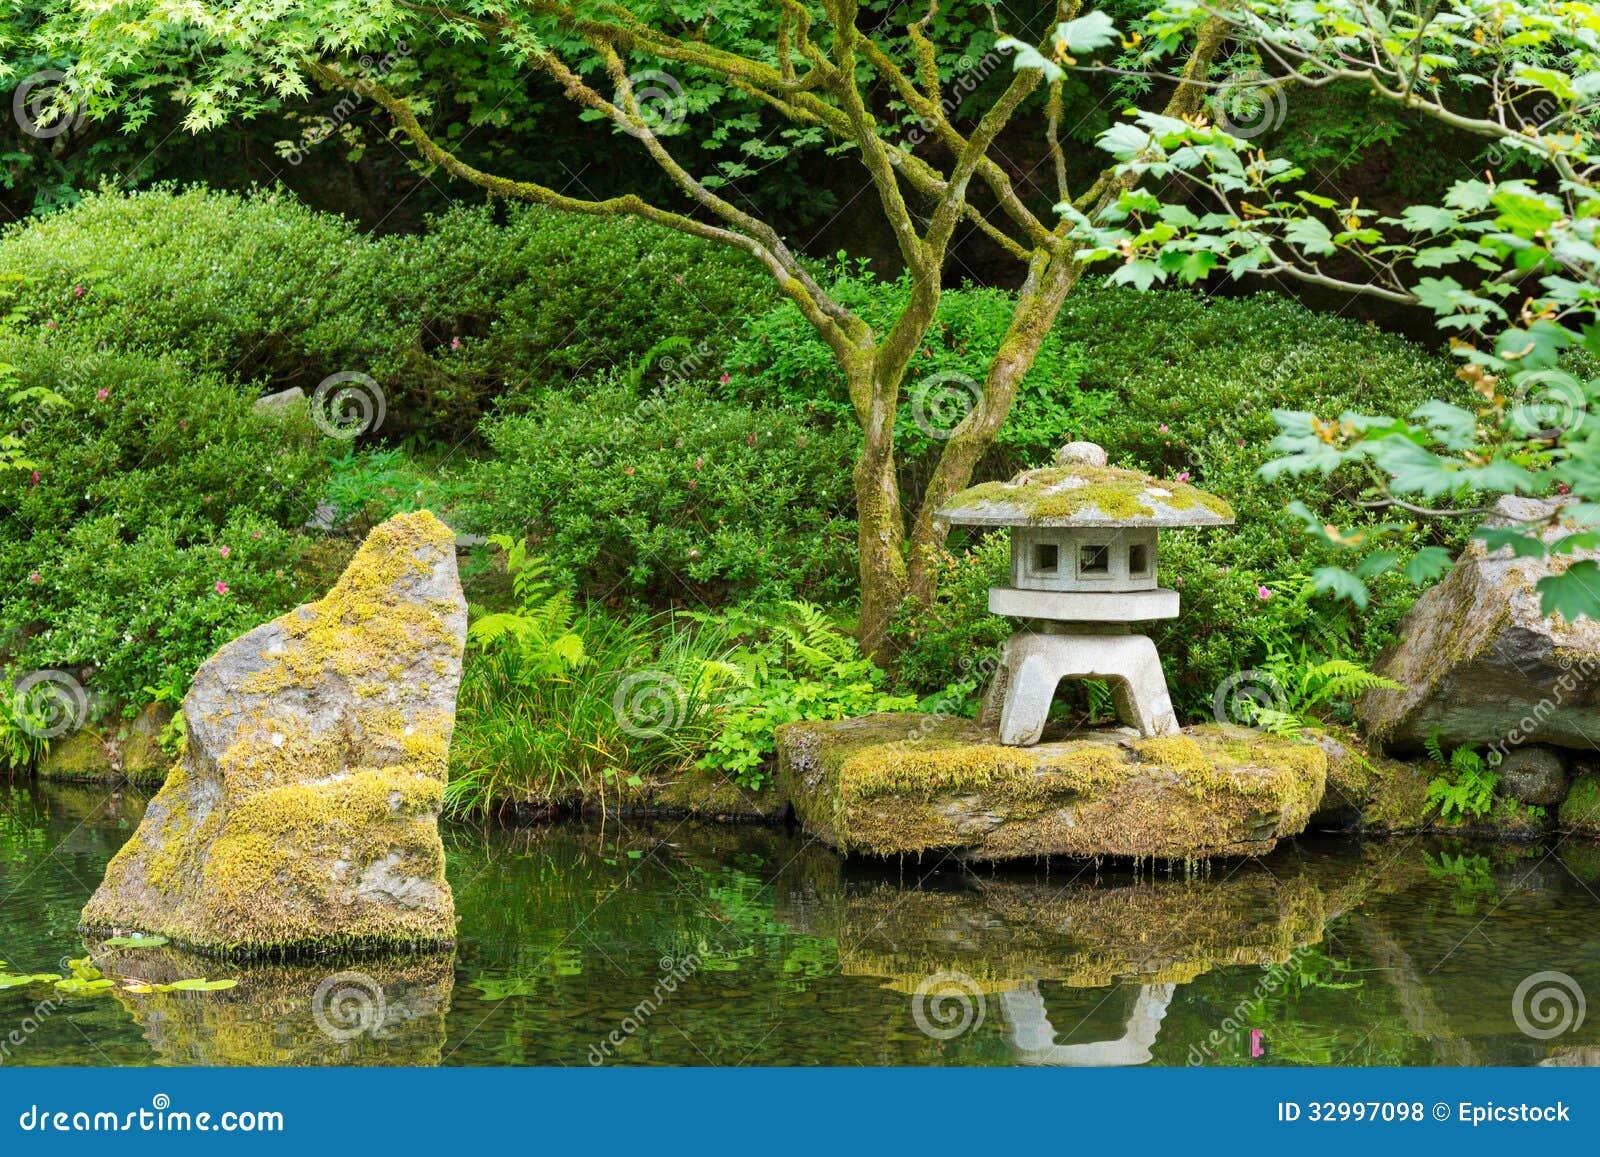 Beautiful japanese garden stock photo image of pedestrian for Amazing japanese zen garden design